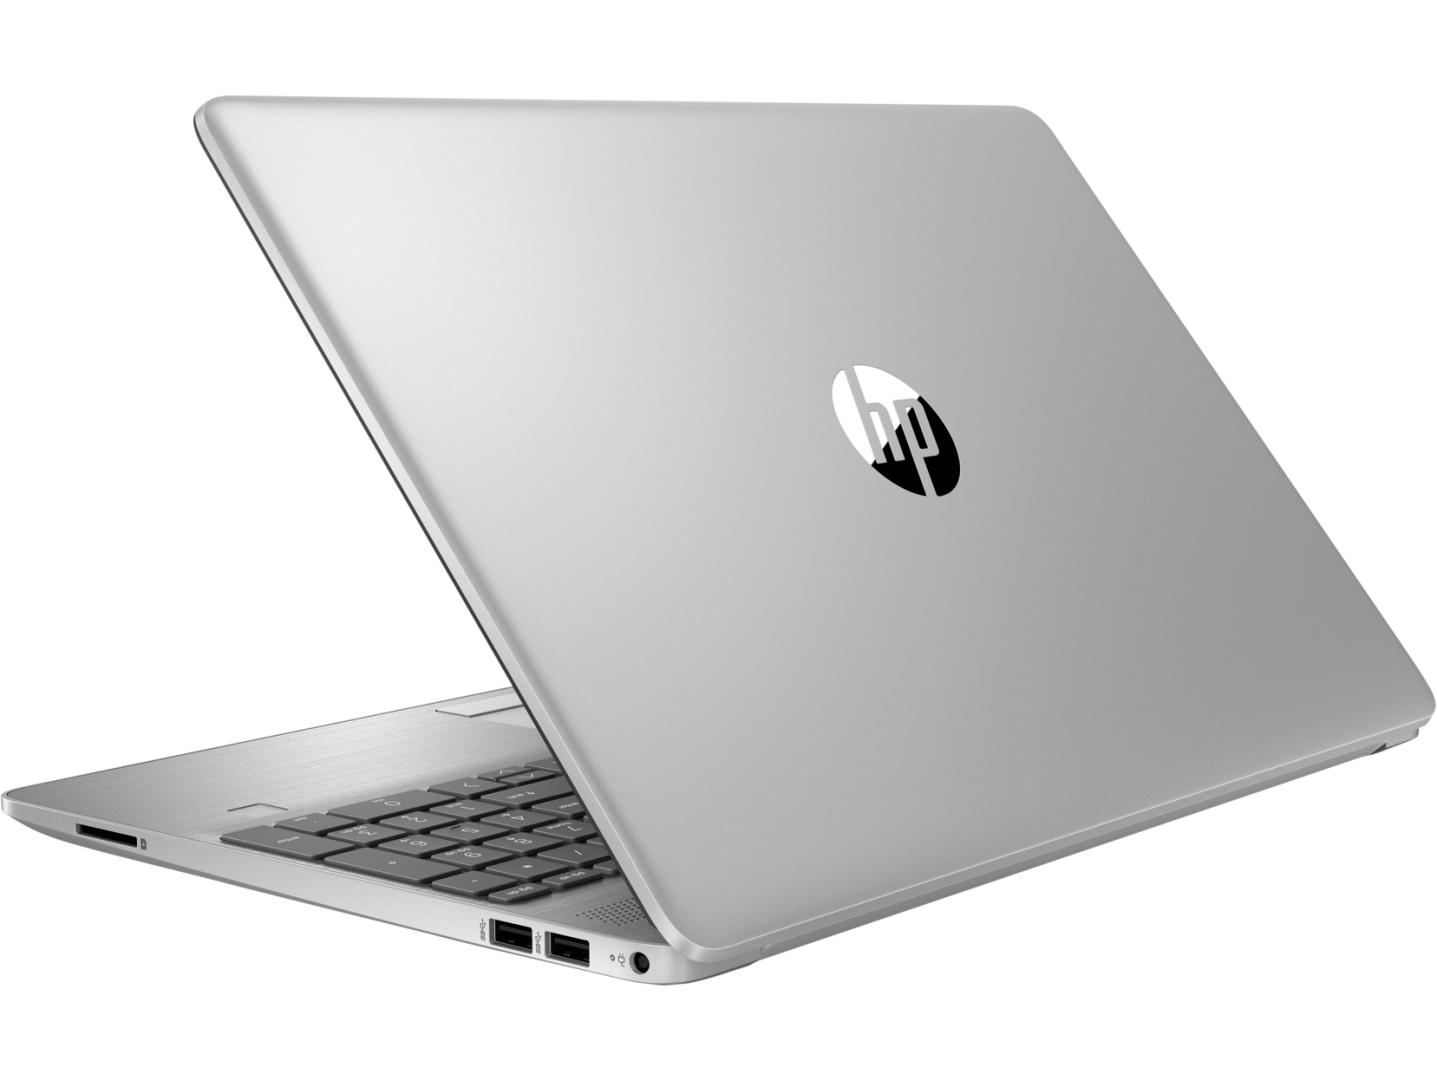 "NOTEBOOK HP 250G8 15.6"" FHD i7-1065G7 8GB 512GB UMA W10P - imaginea 3"